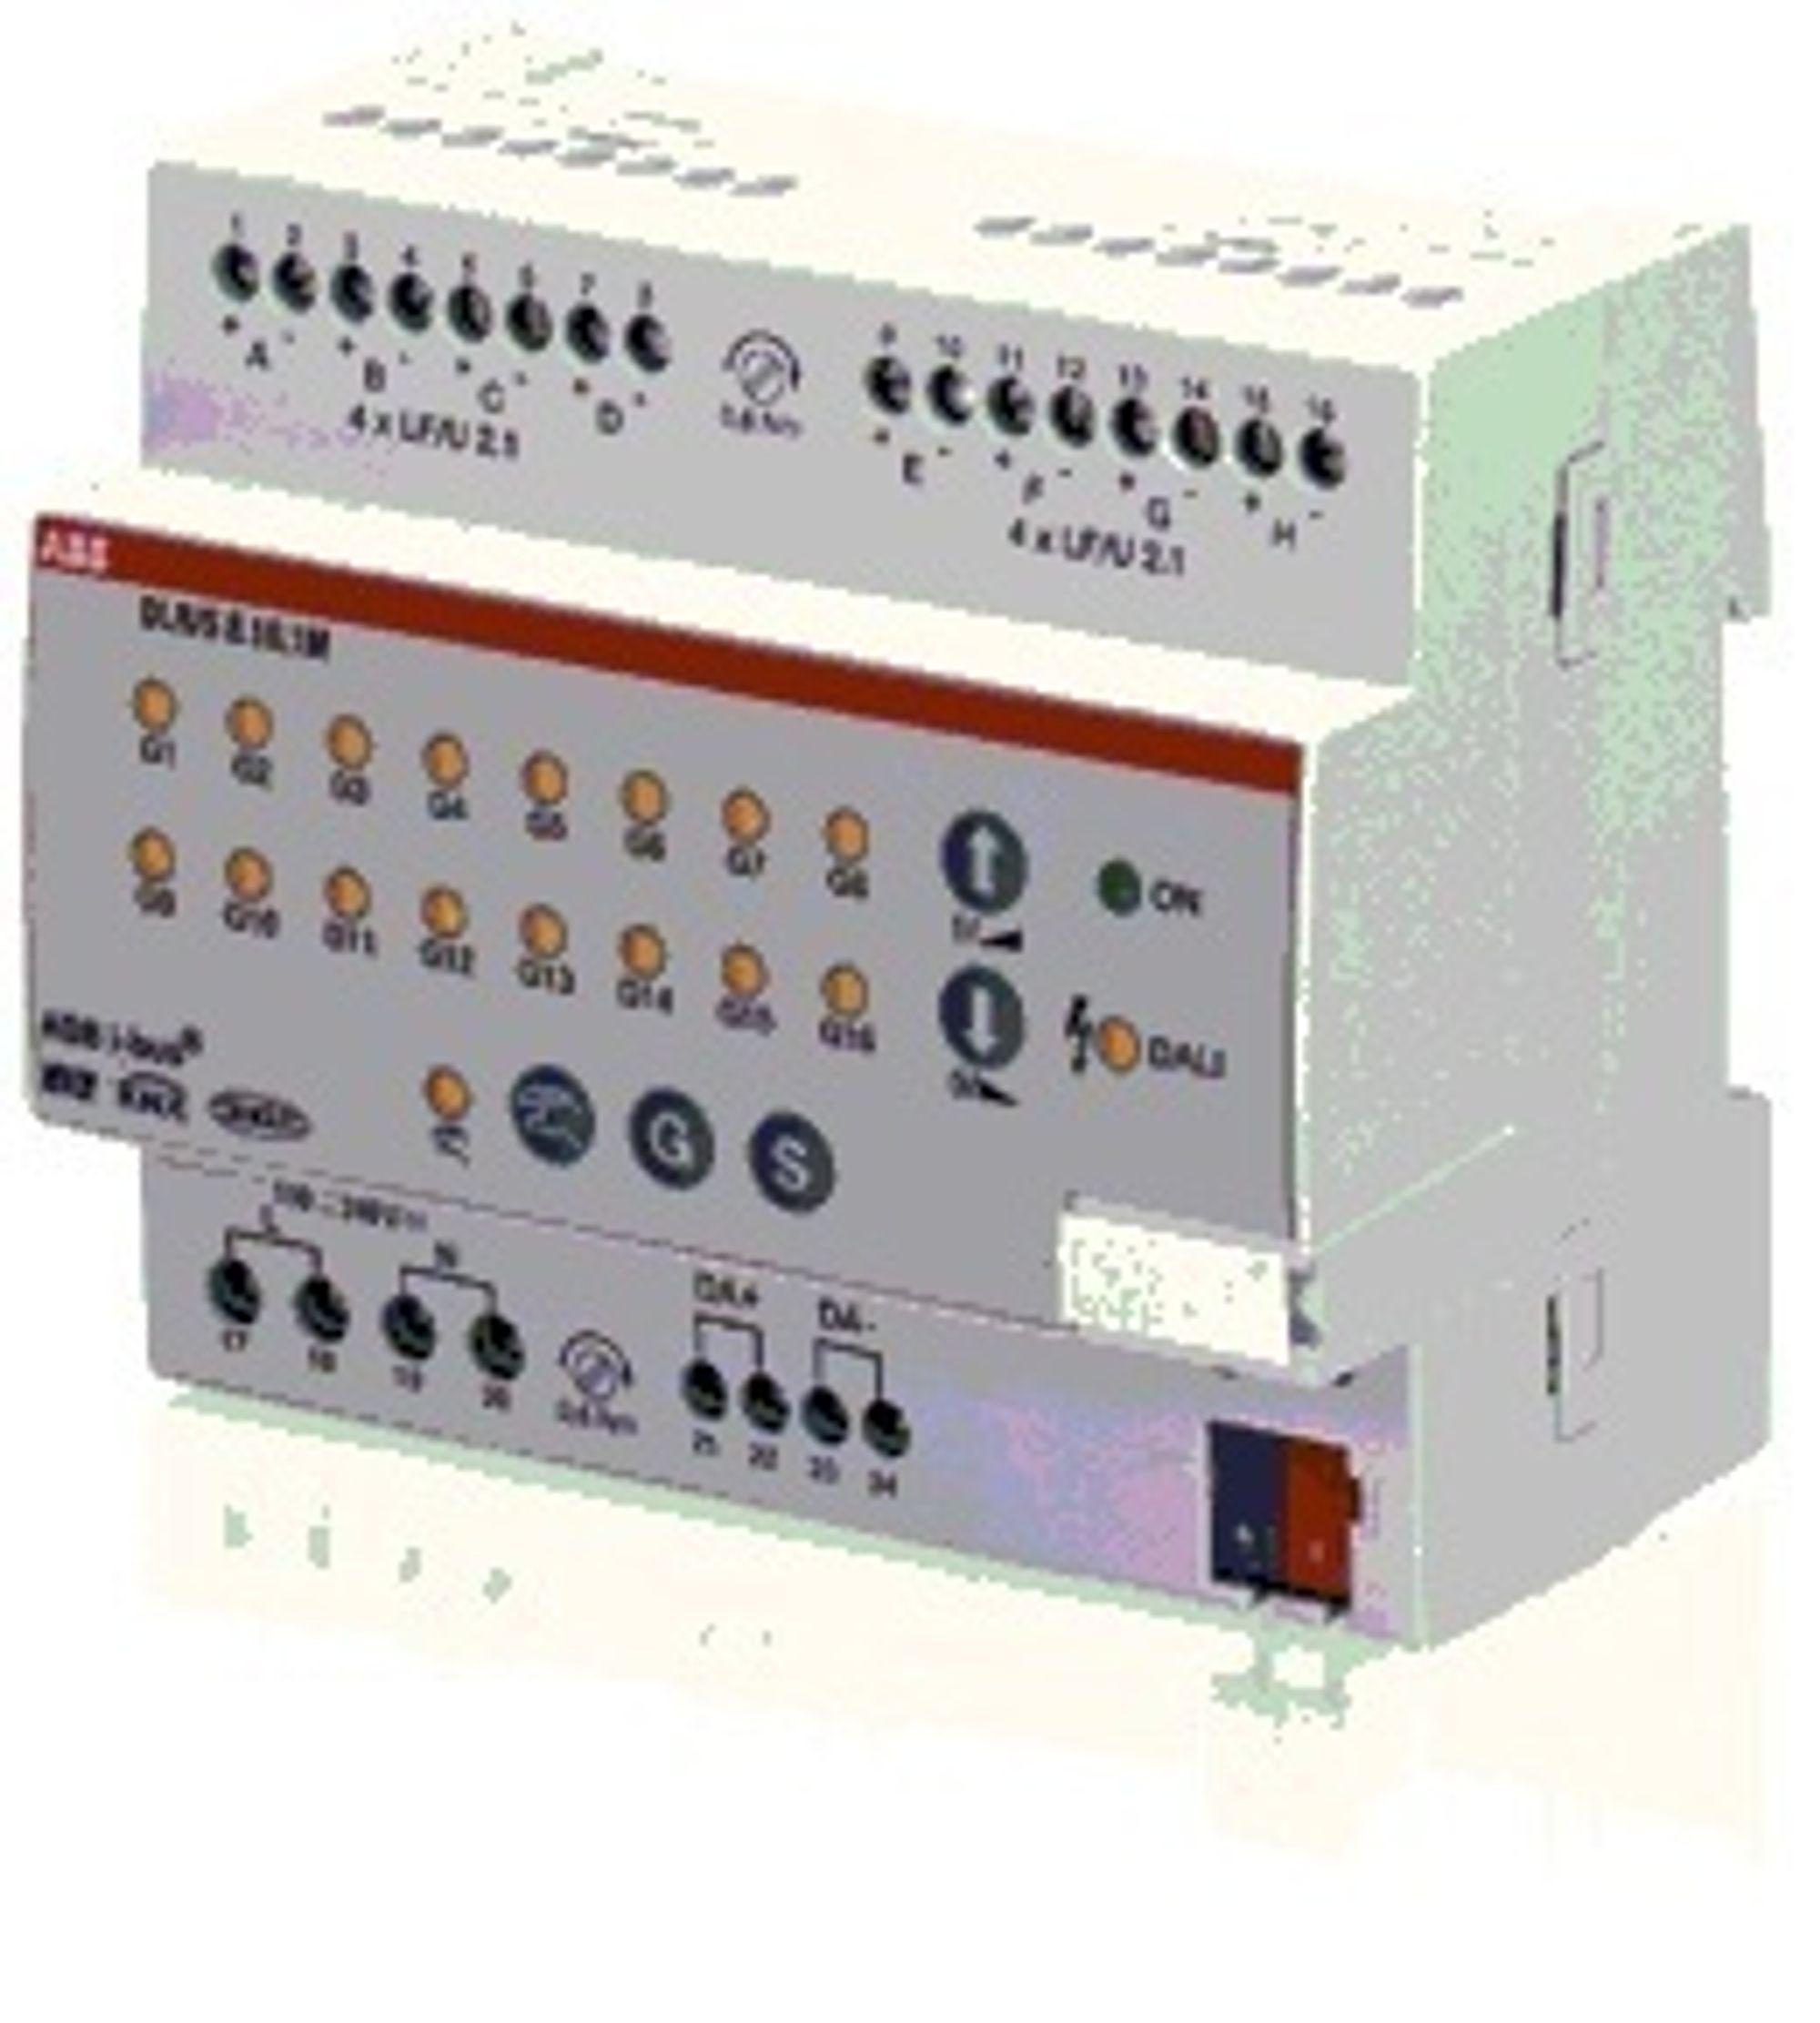 Energibesparende lysstyring